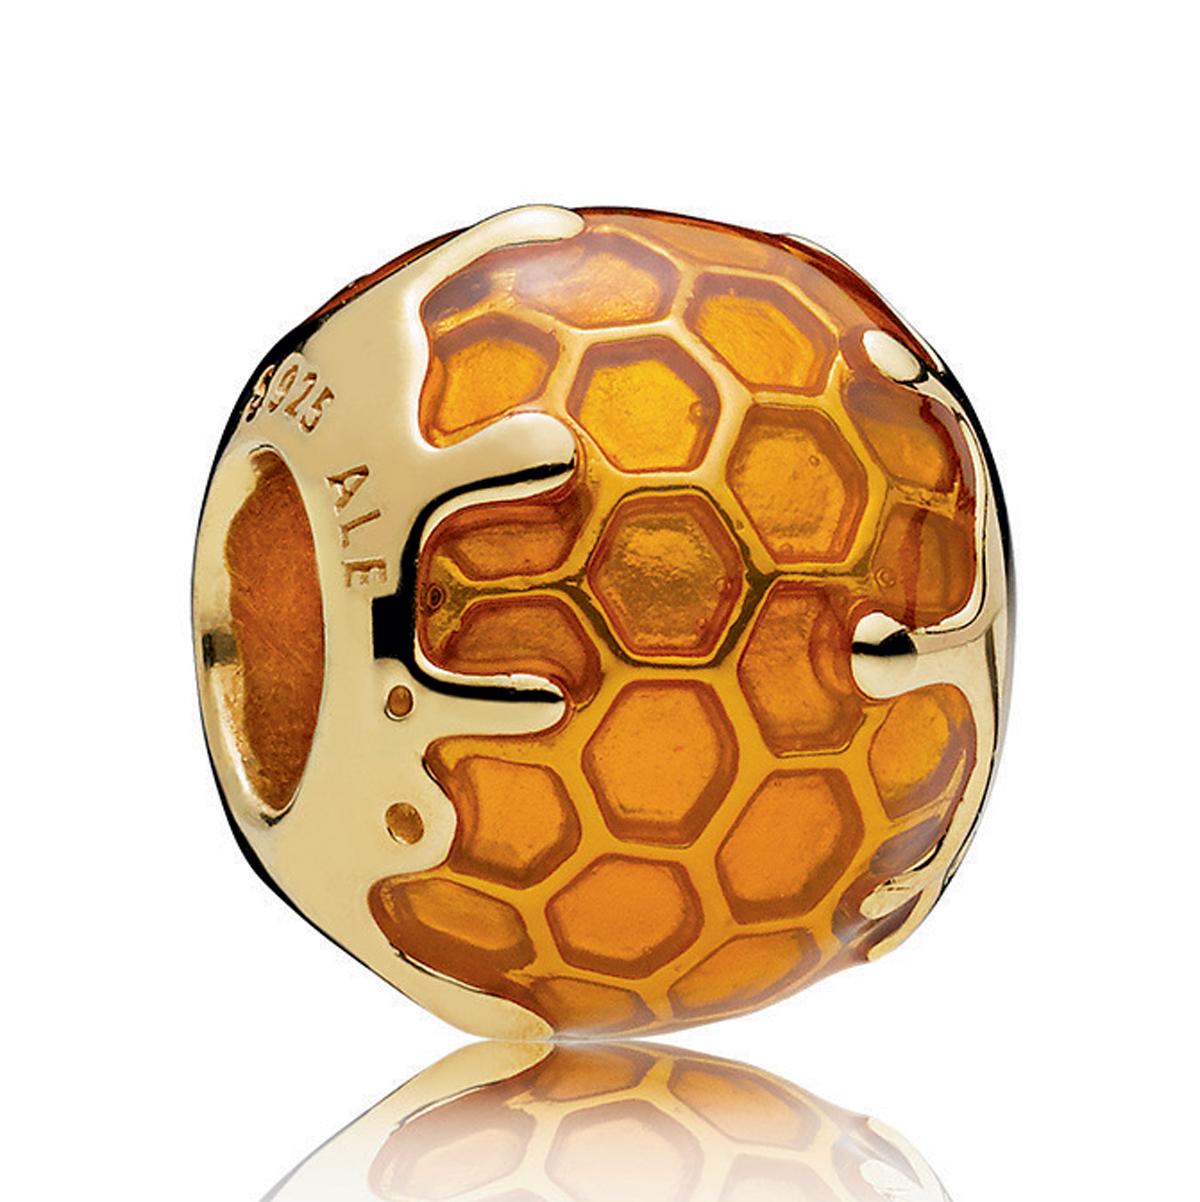 7//8 inch x 5//8 inch 50PCs Metal Charm Pendants Bee Gold Tone 21mm x 16mm G9